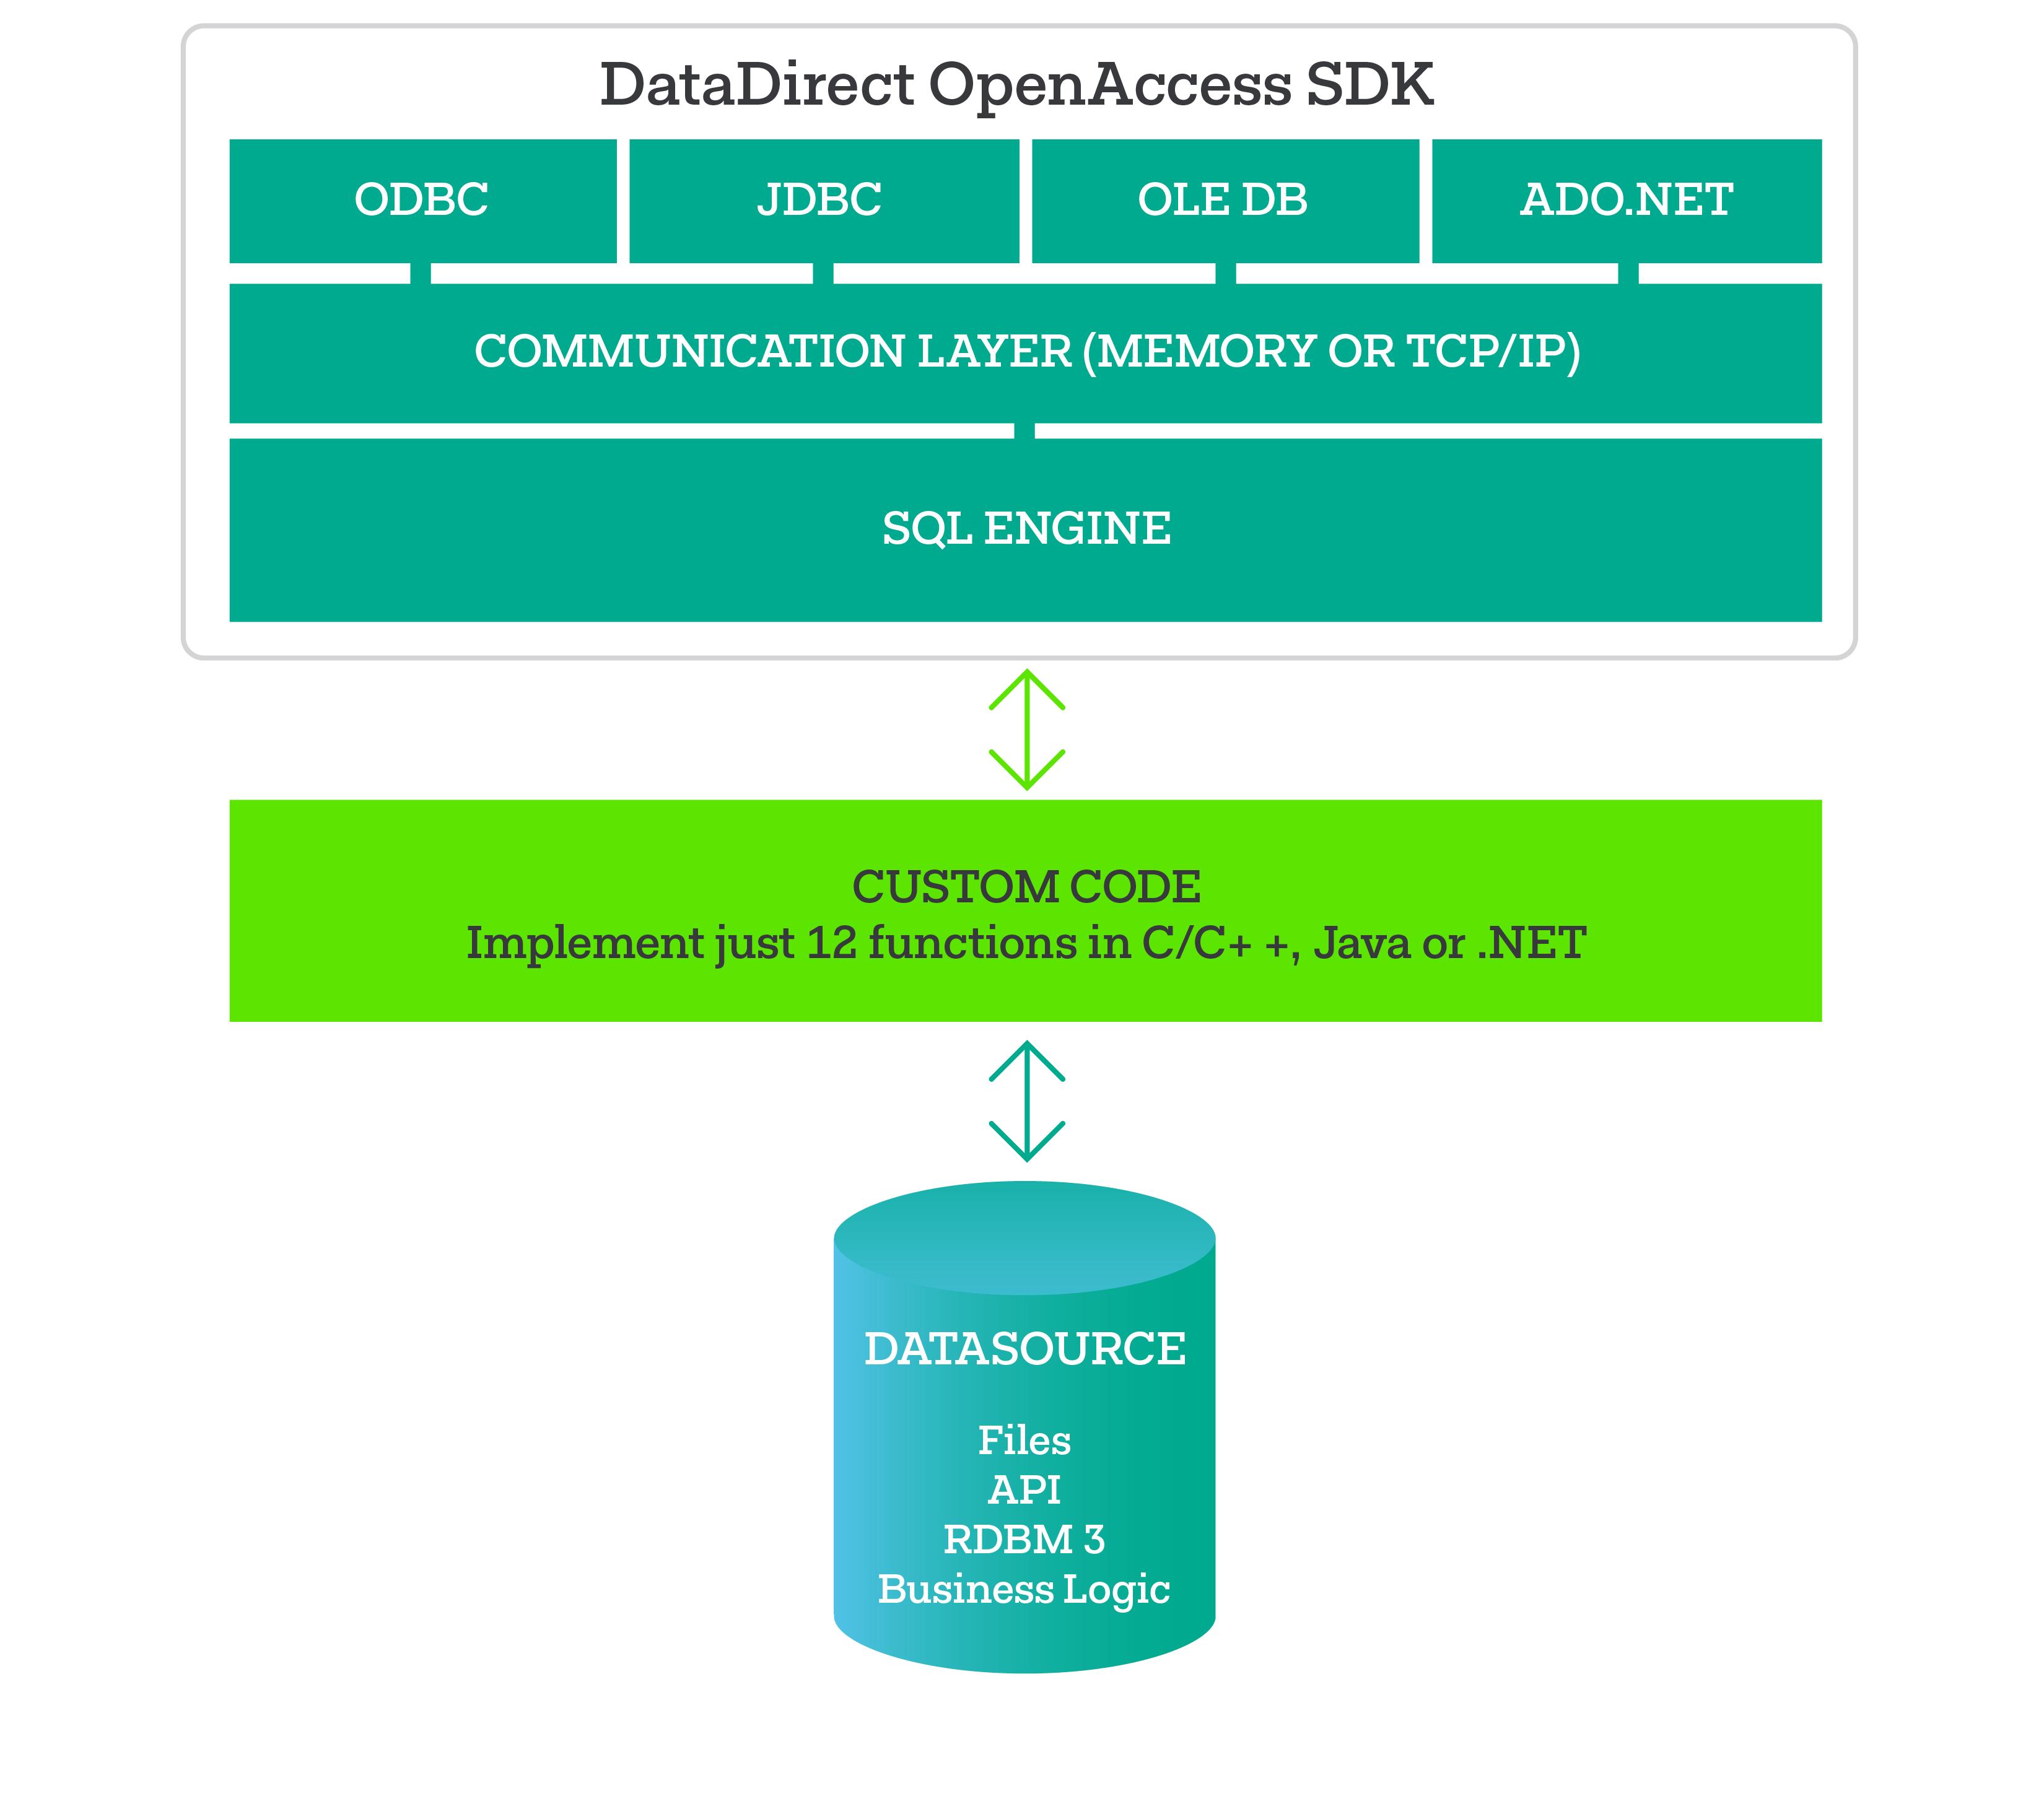 OpenAccess SDK